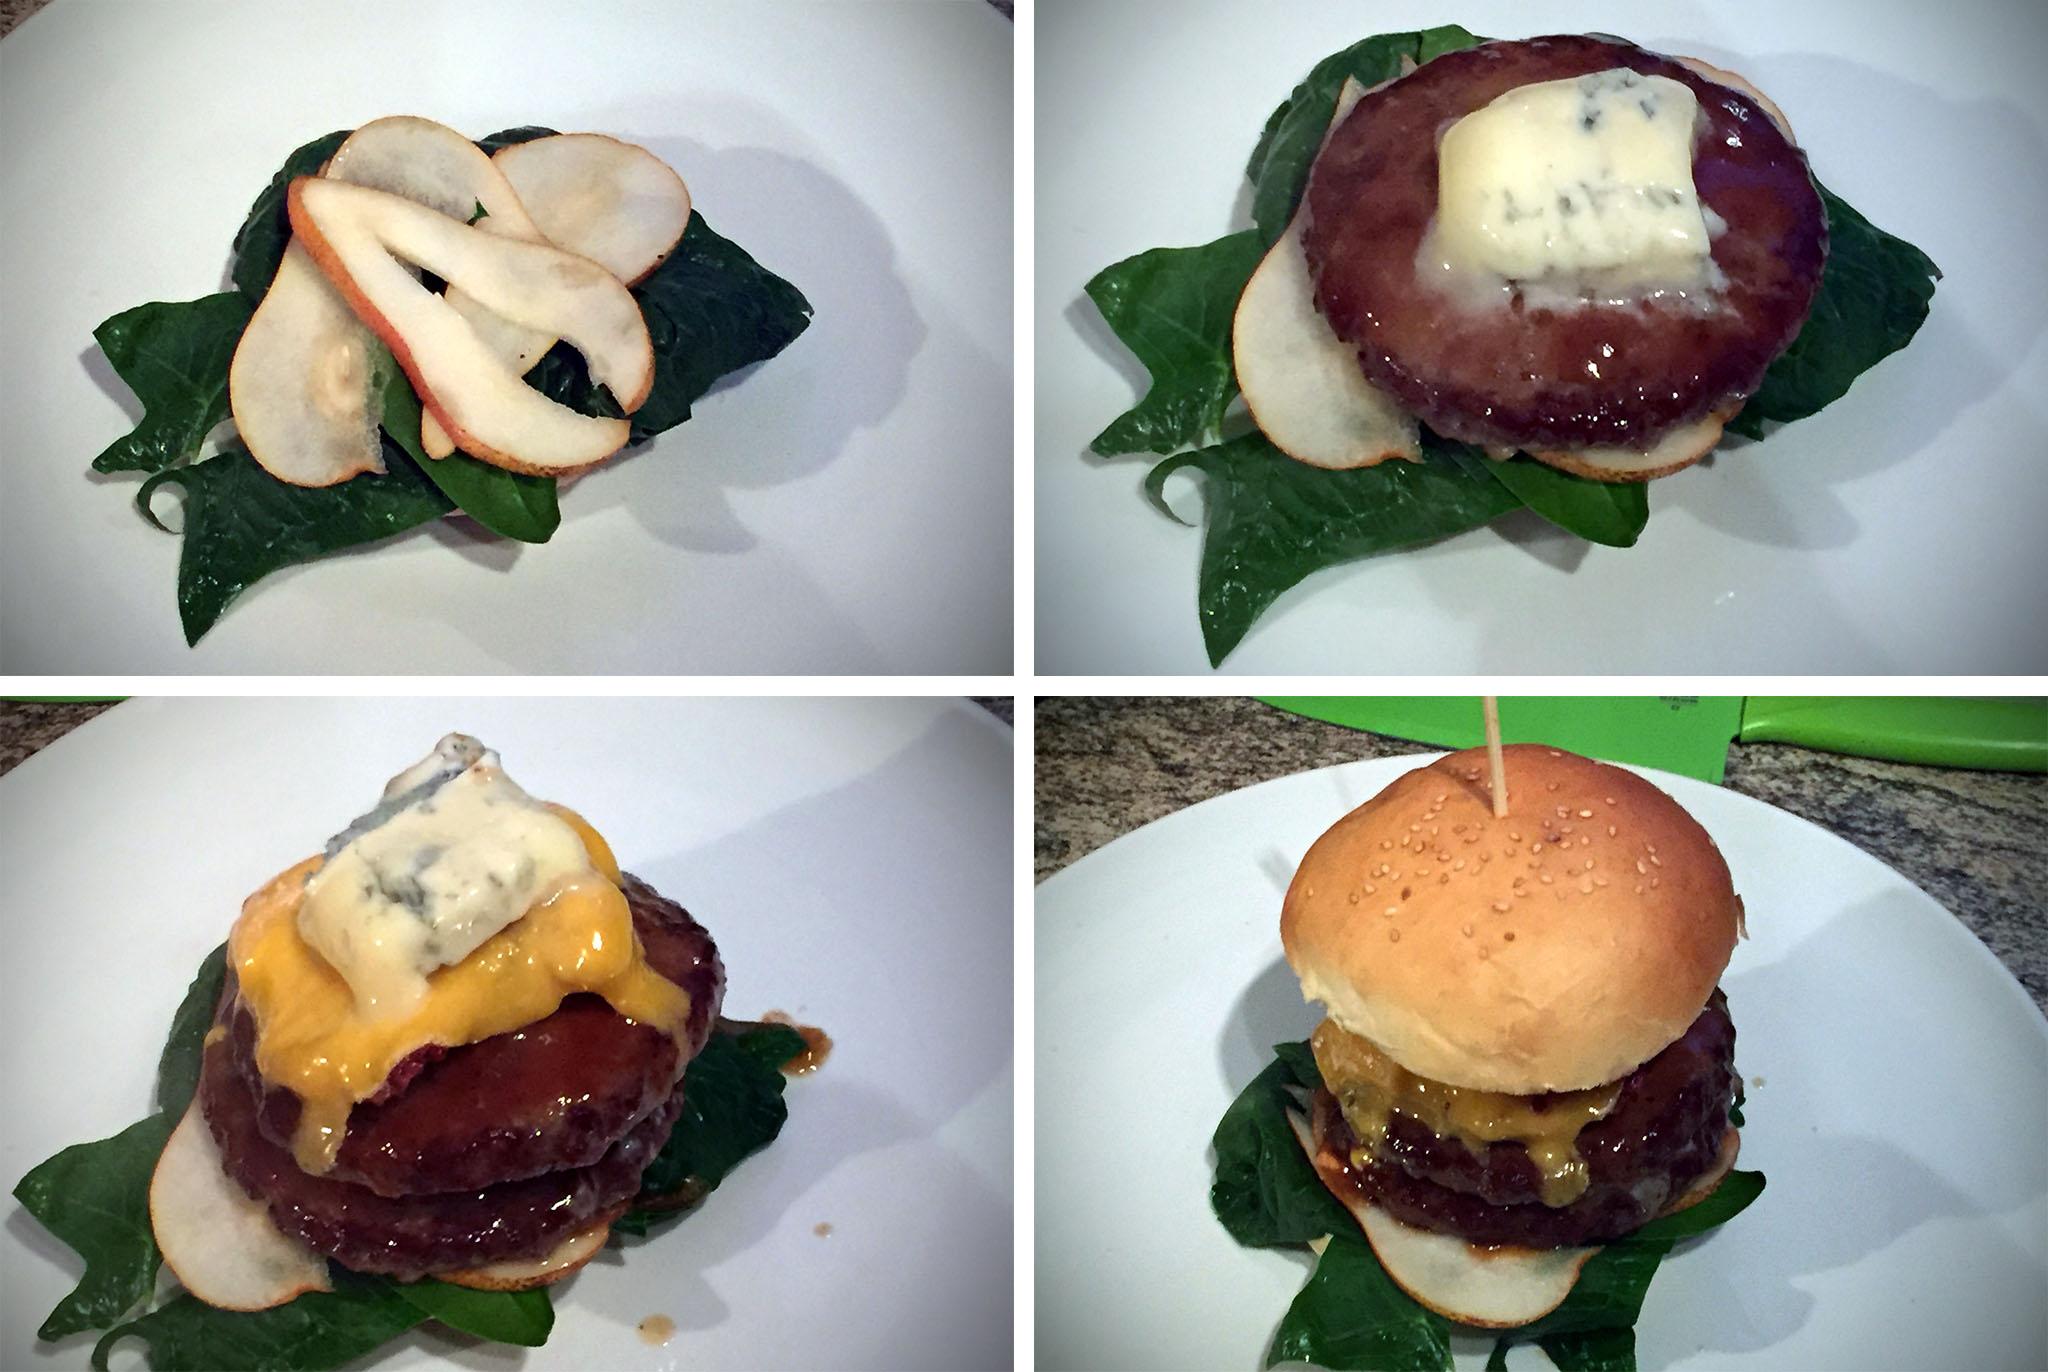 burger belegen it 39 s a hoomygumb. Black Bedroom Furniture Sets. Home Design Ideas